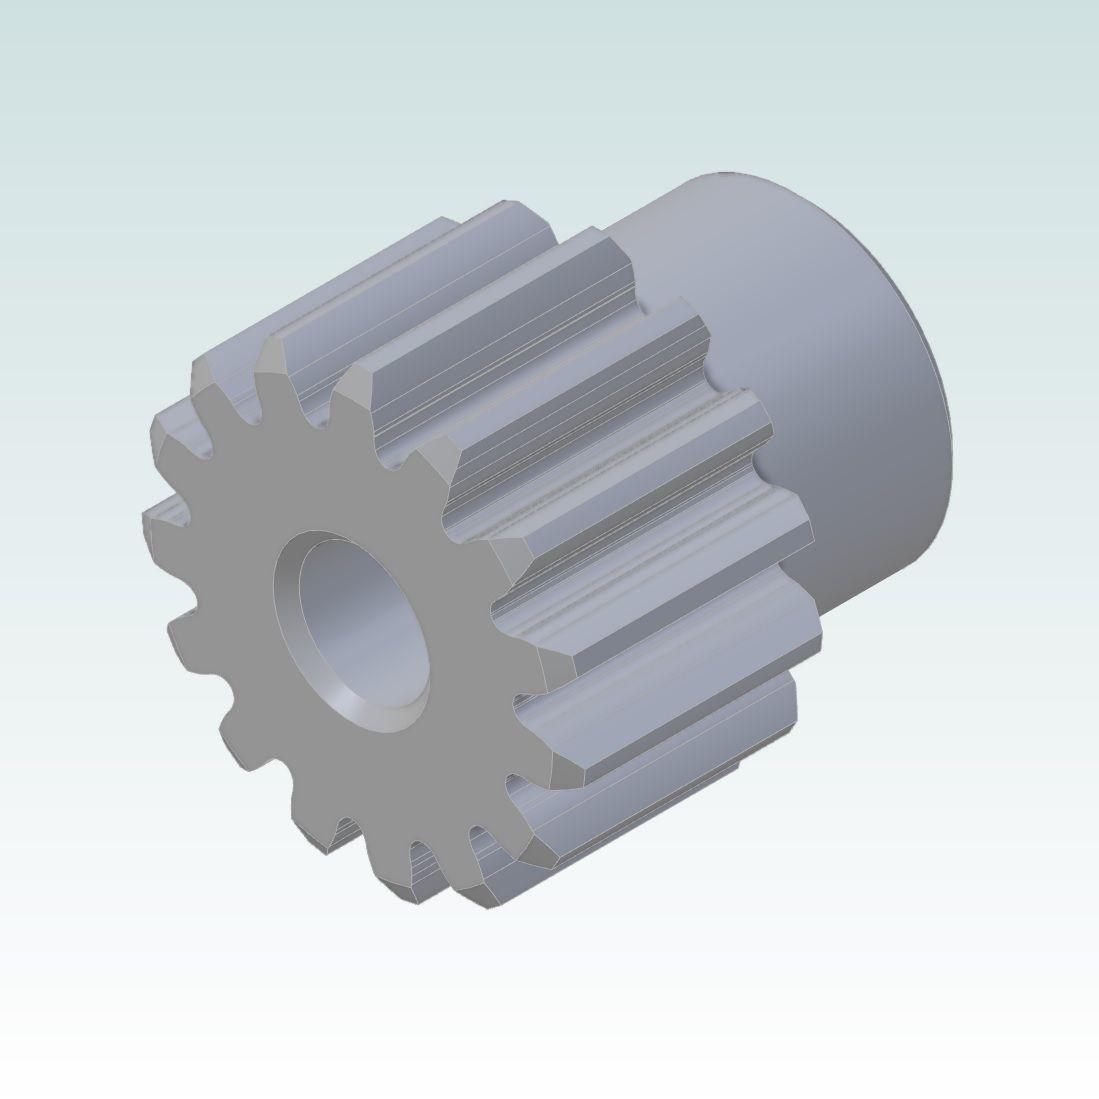 module 2 gear with 15 teeth